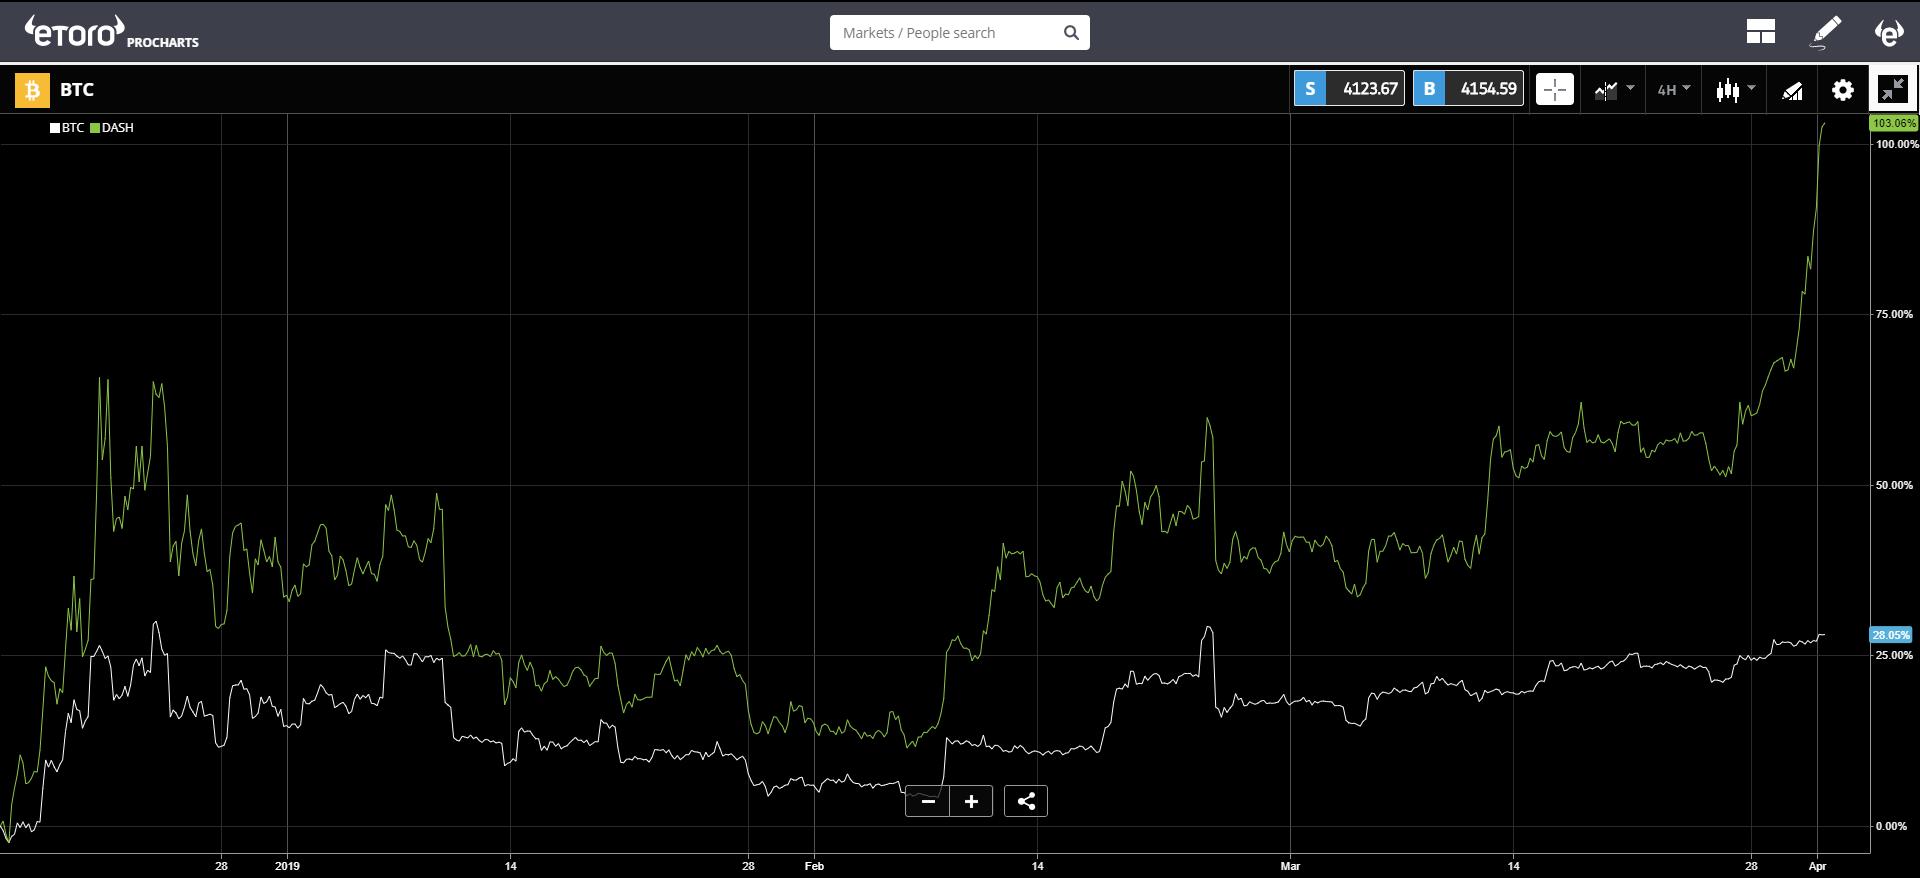 market, stocks, cryptocurrency, bitcoin, blockchain, ethereum, trading